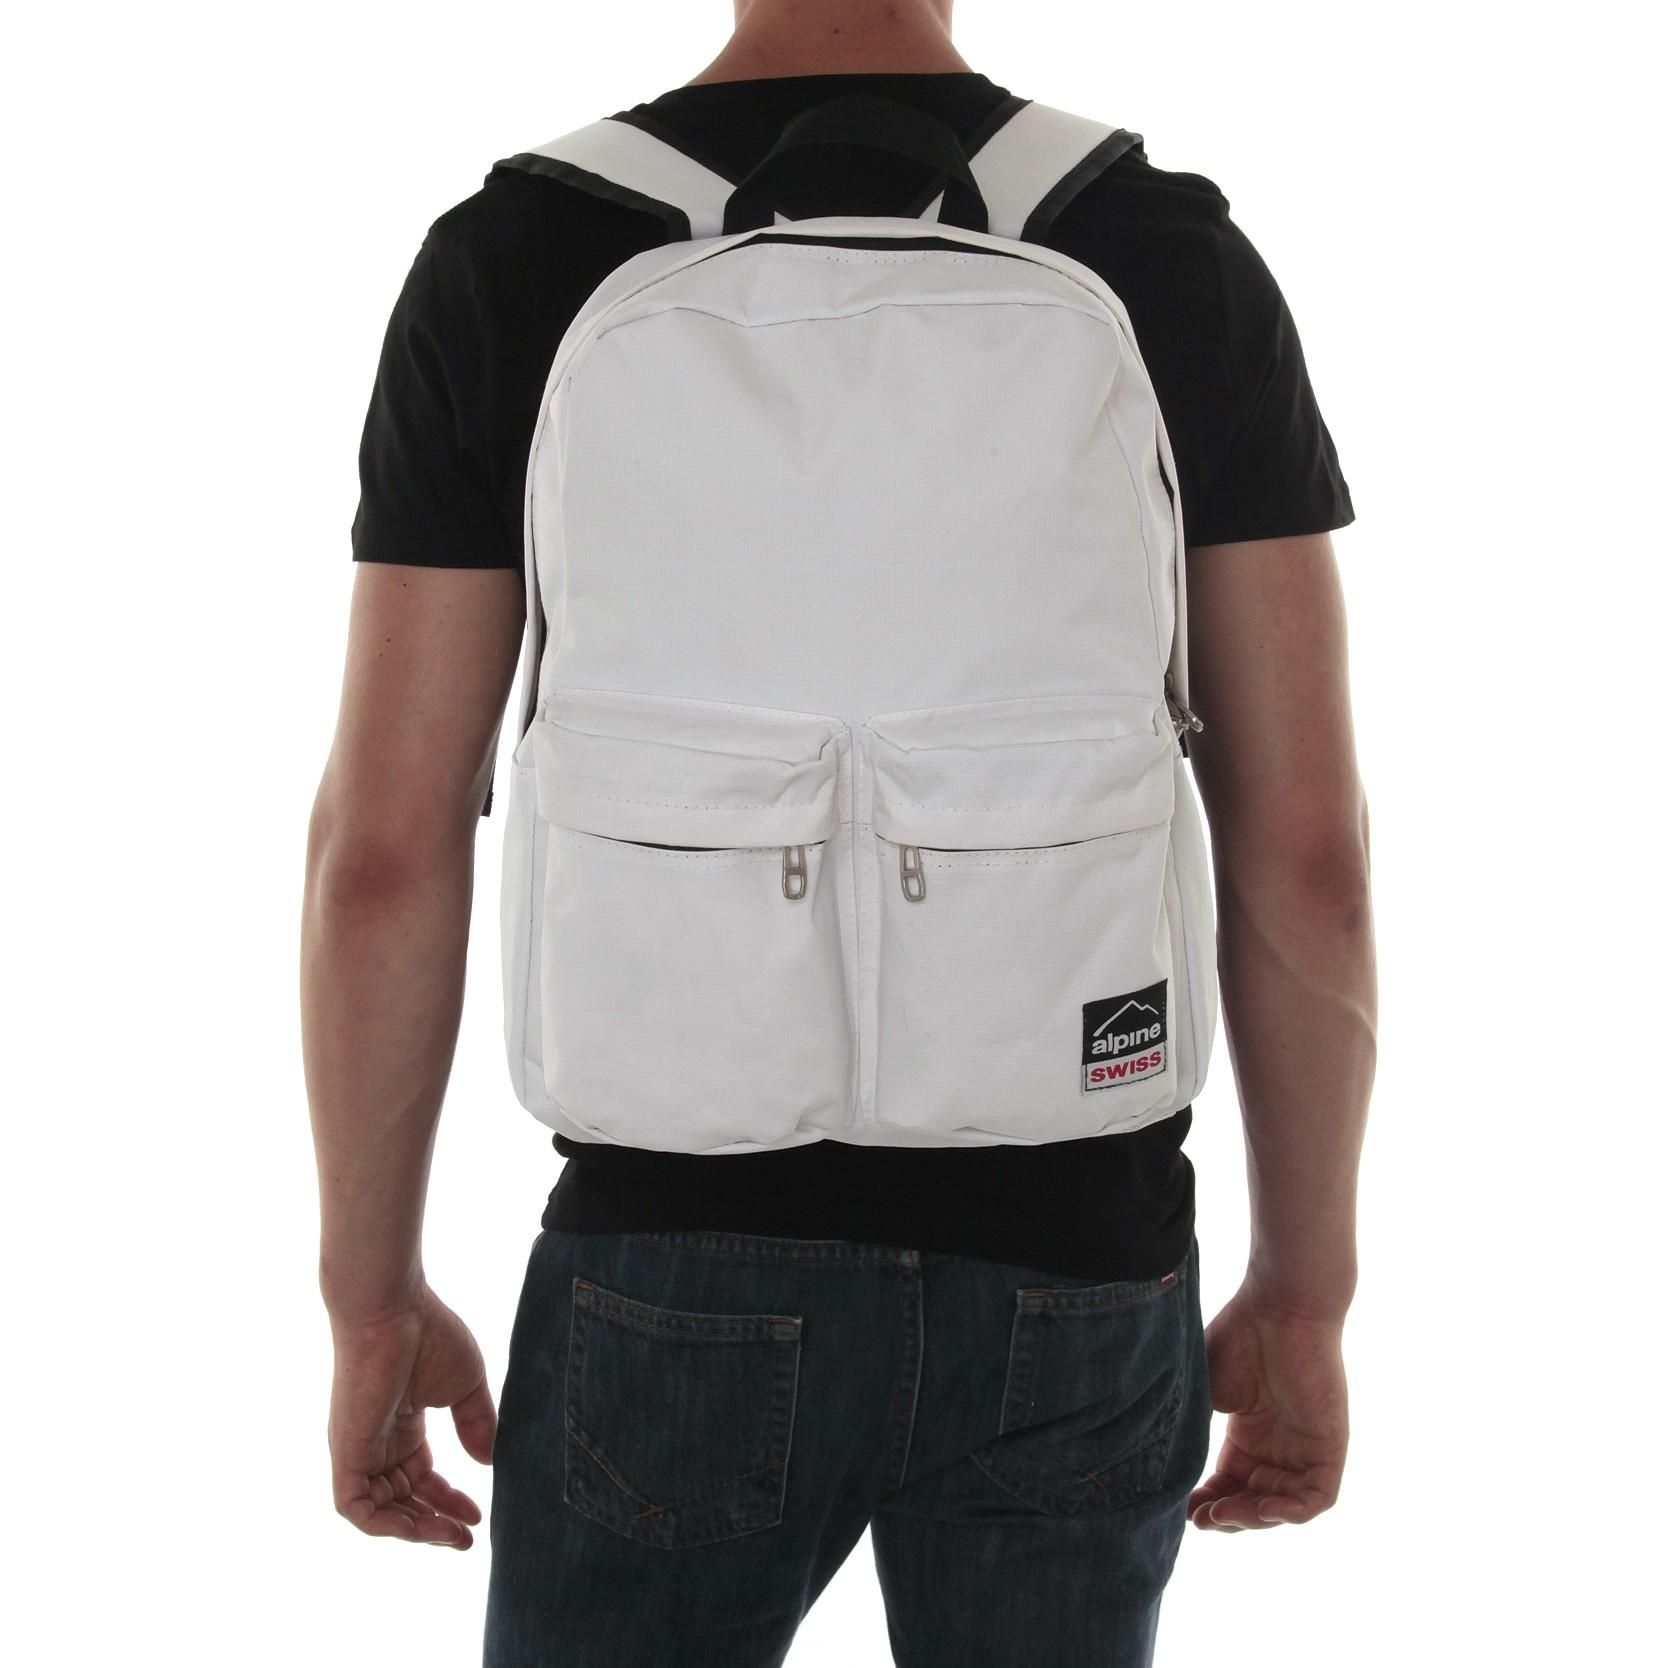 Alpine Swiss Major Back Pack Bookbag School Bag Daypack 1 ...